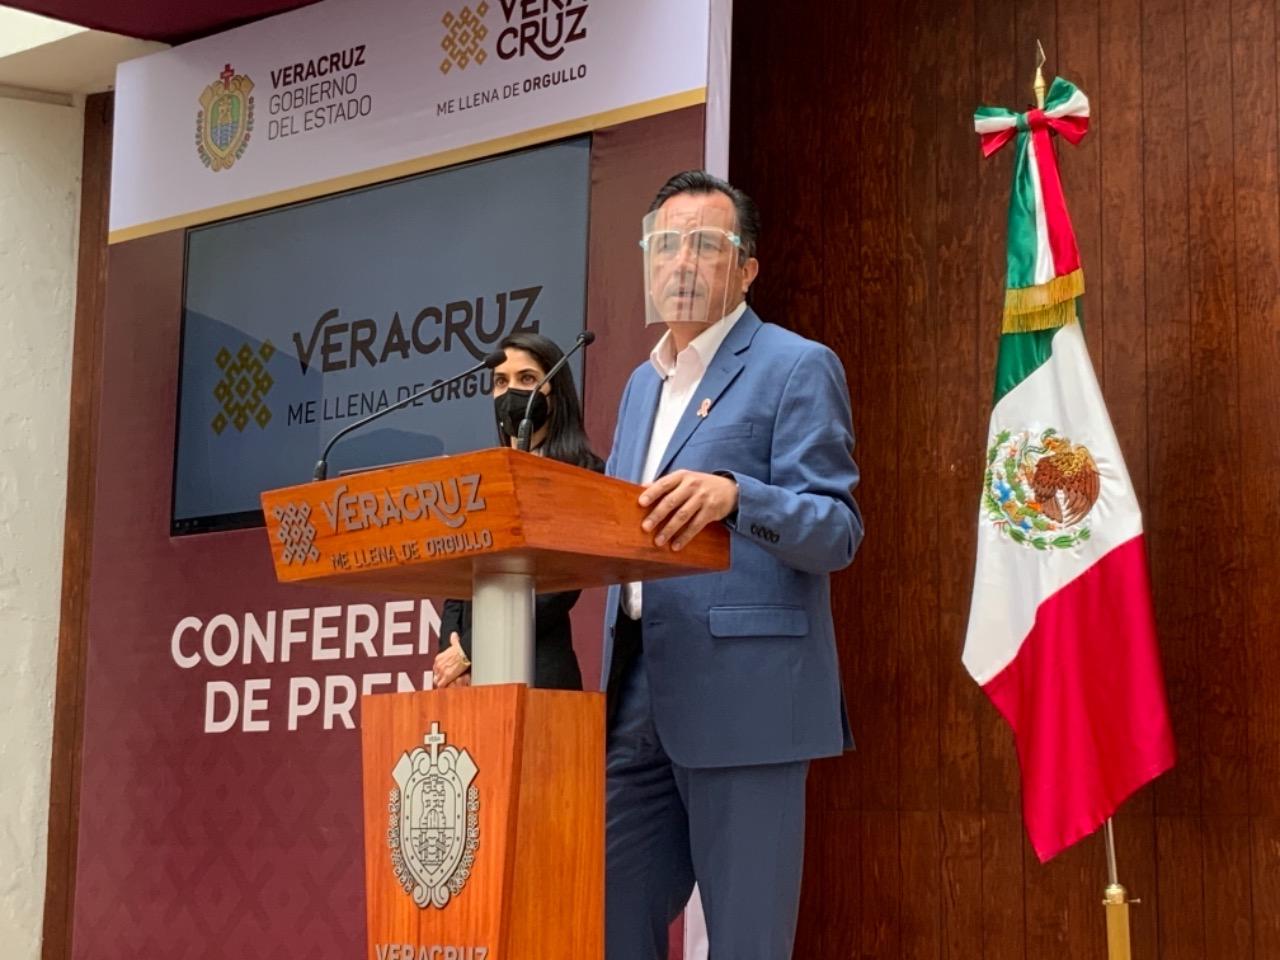 Confirma Gobernador tercera alerta preventiva; Veracruz en riesgo de regresar a semáforo rojo